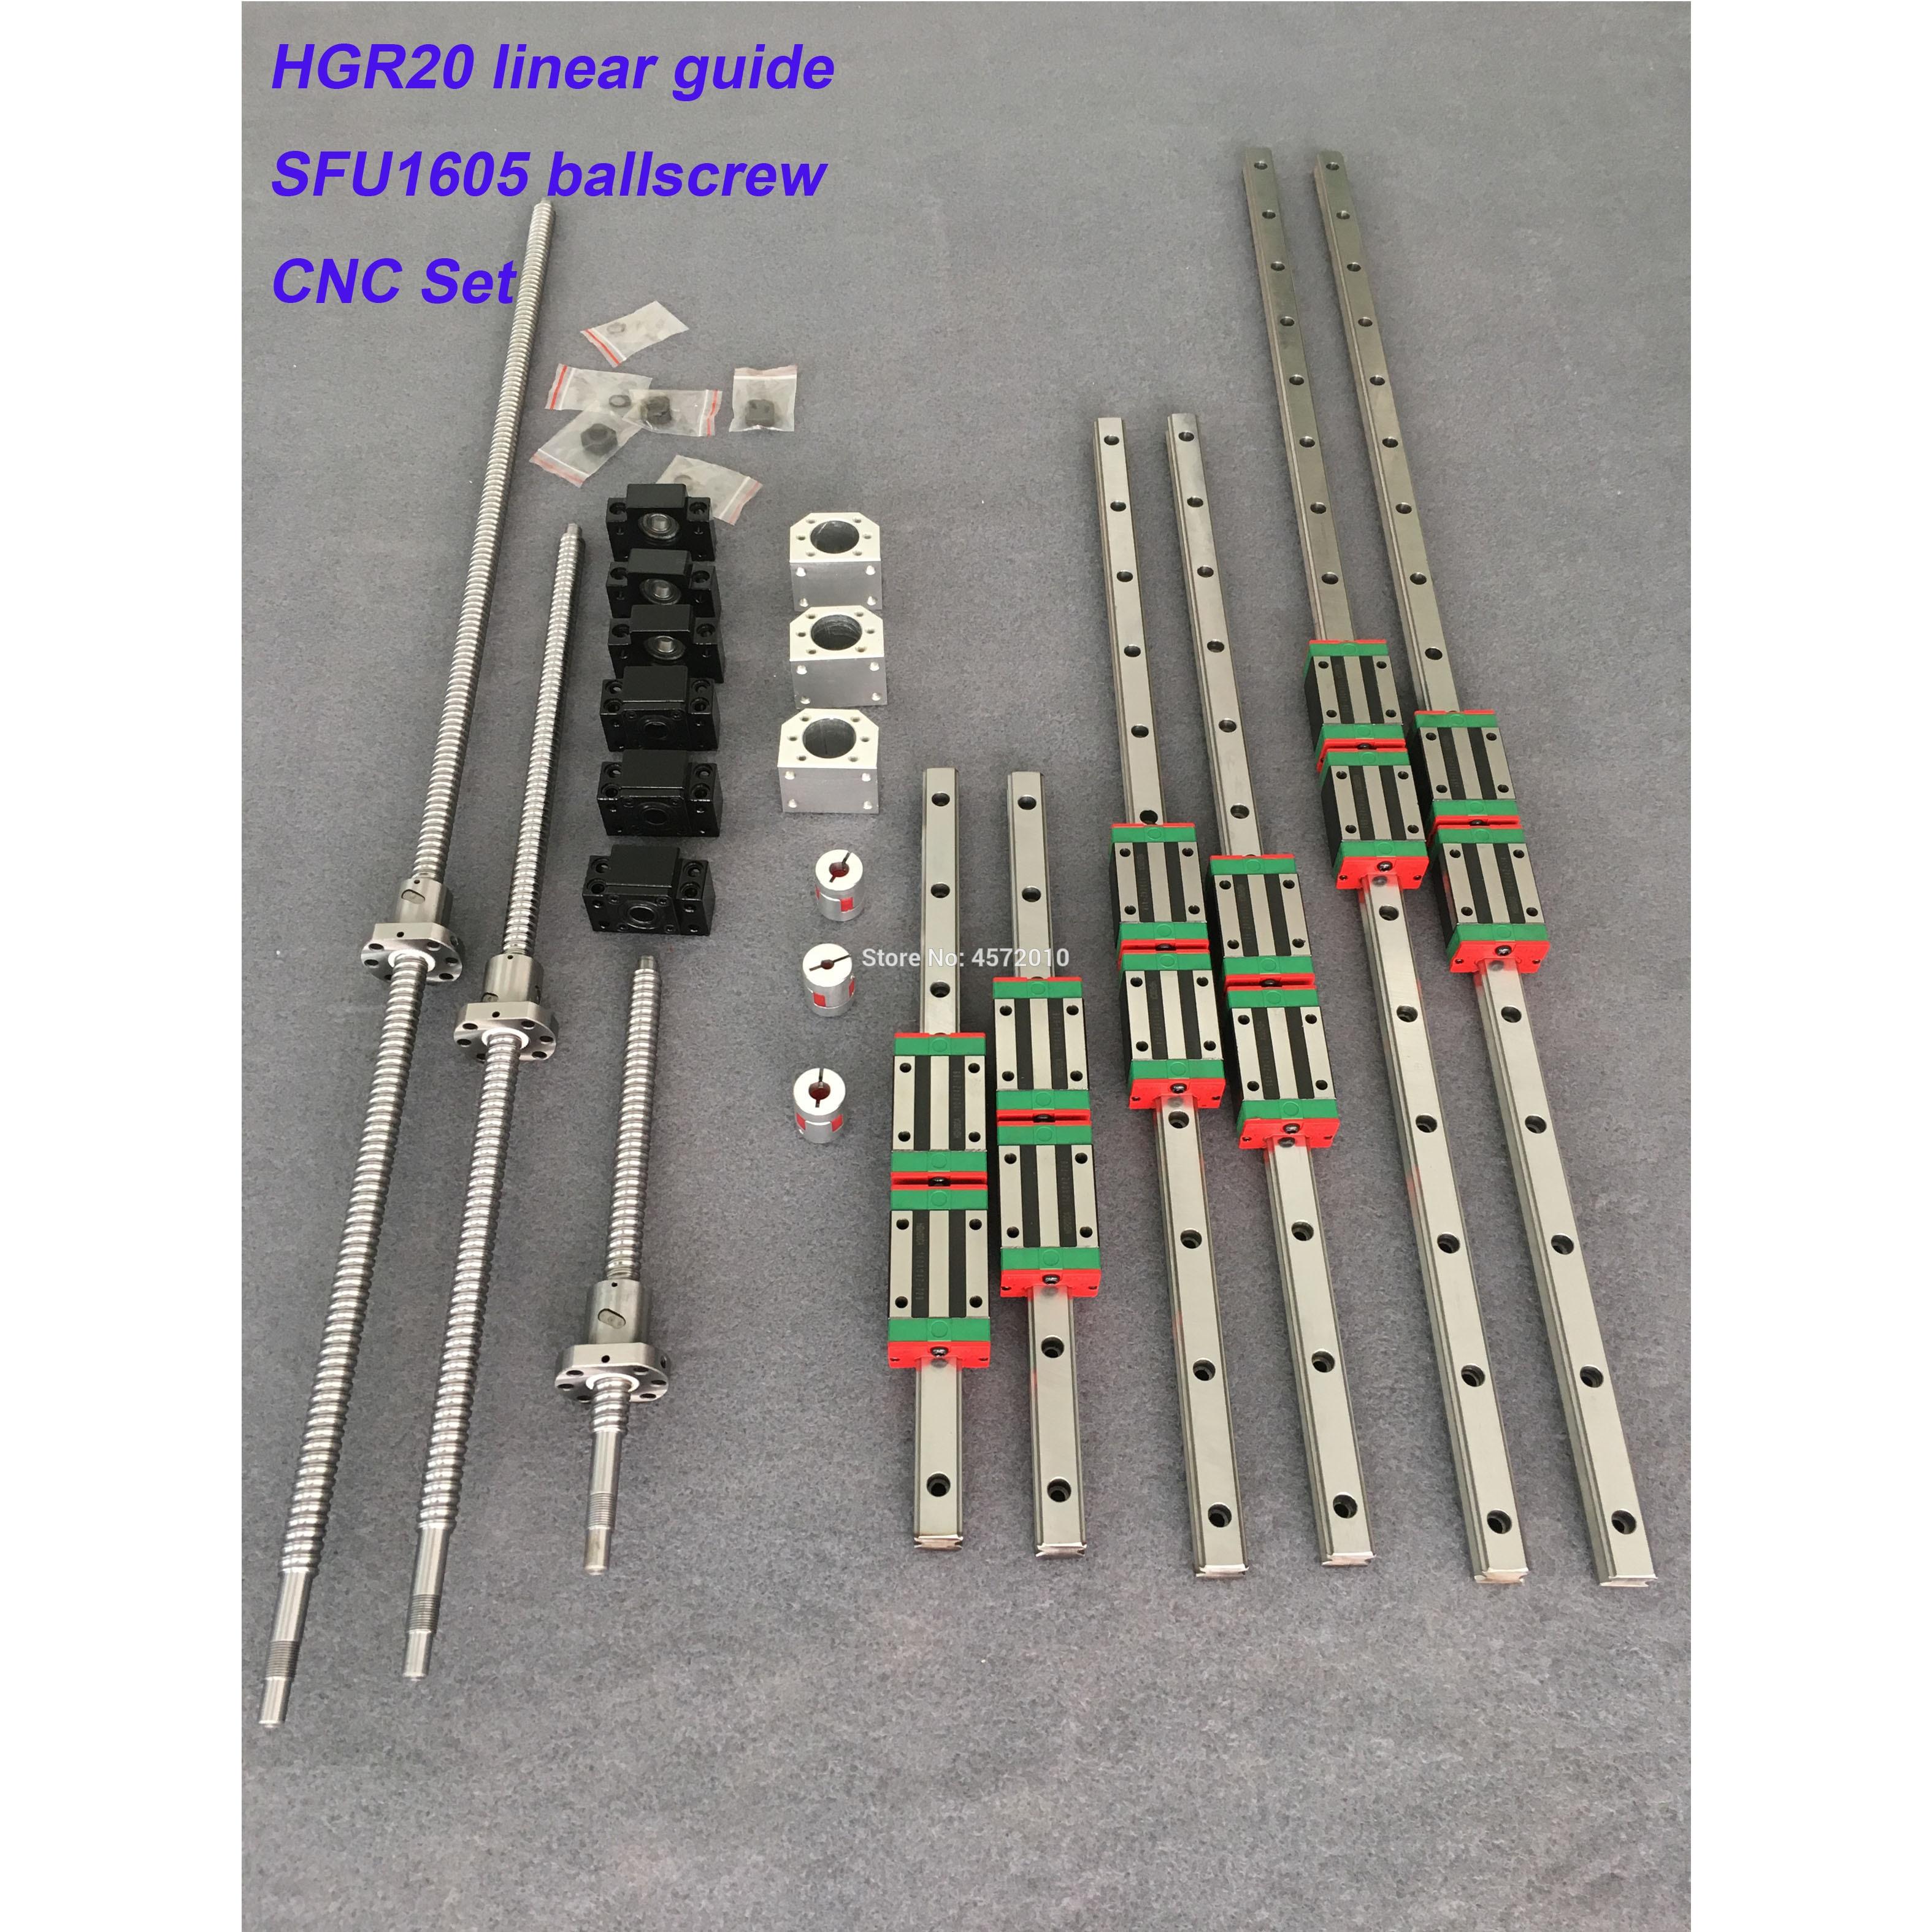 HGR20-قضيب خطي مربع CNC ، 3 محاور ، 4 محاور ، دليل خطي 20 مللي متر ، HGH20 16 مللي متر ، لولب كروي SFU1605/1610 مجموعة لجهاز التوجيه